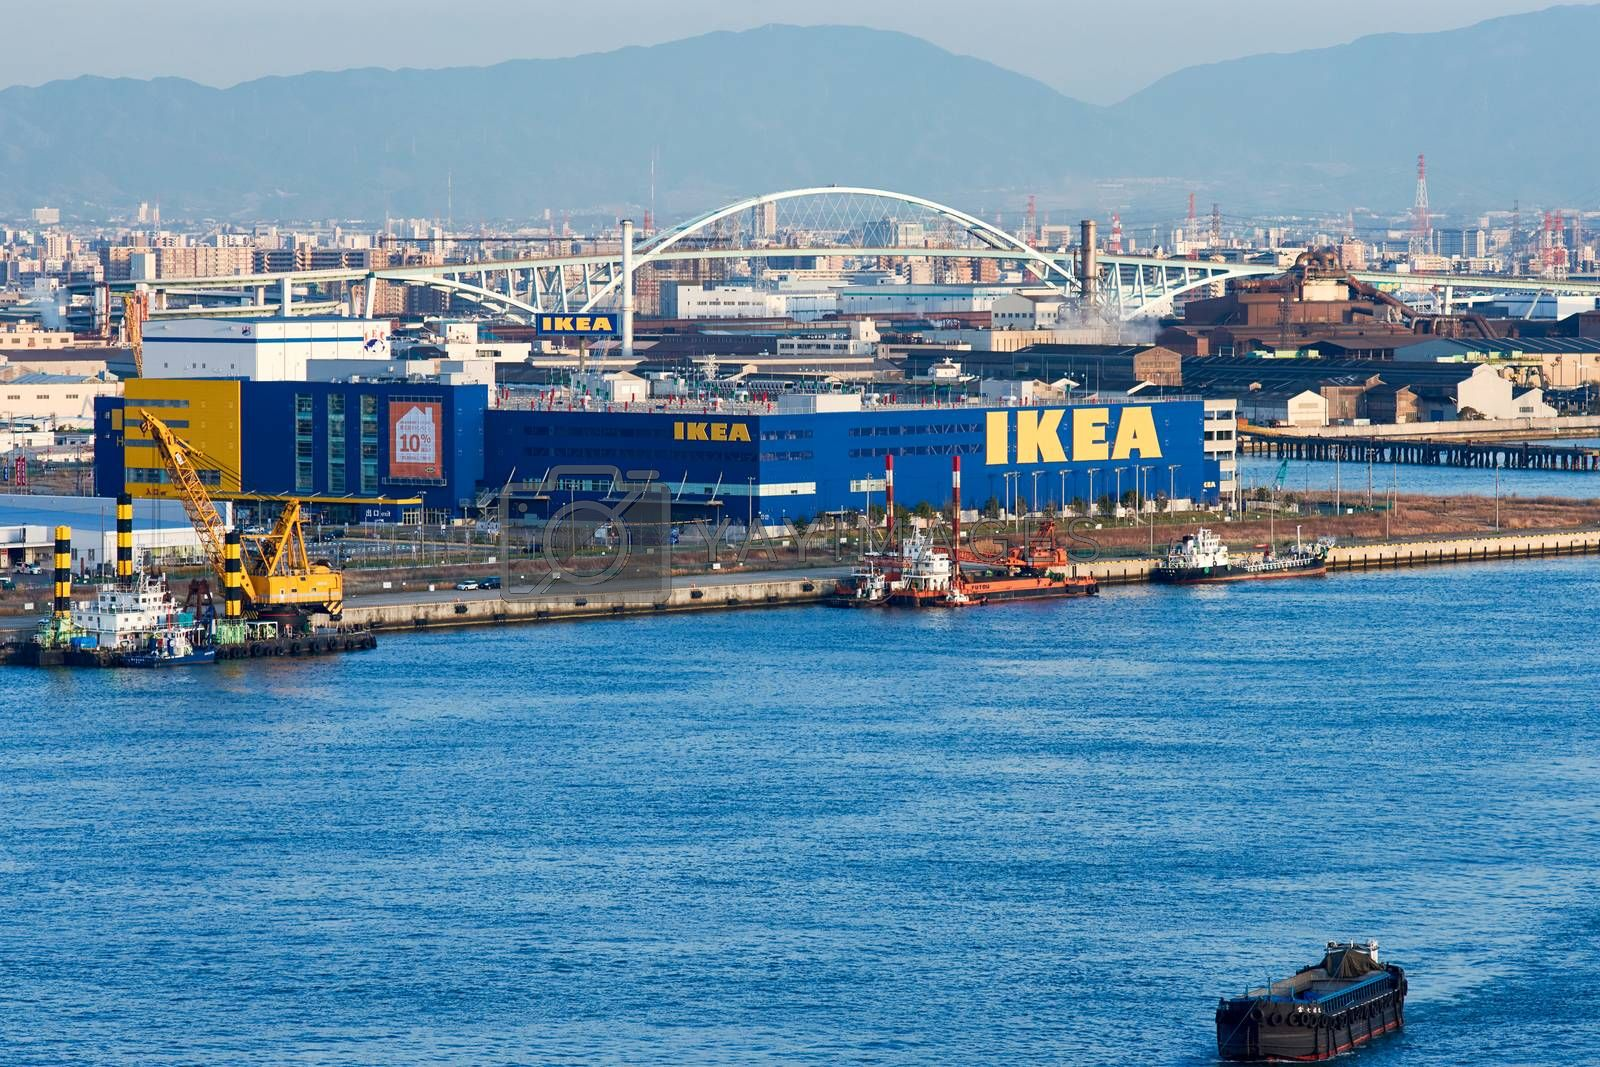 Osaka / Japan - March 23rd 2018: Huge IKEA Tsuruhama store in Osaka port, Osaka, Japan